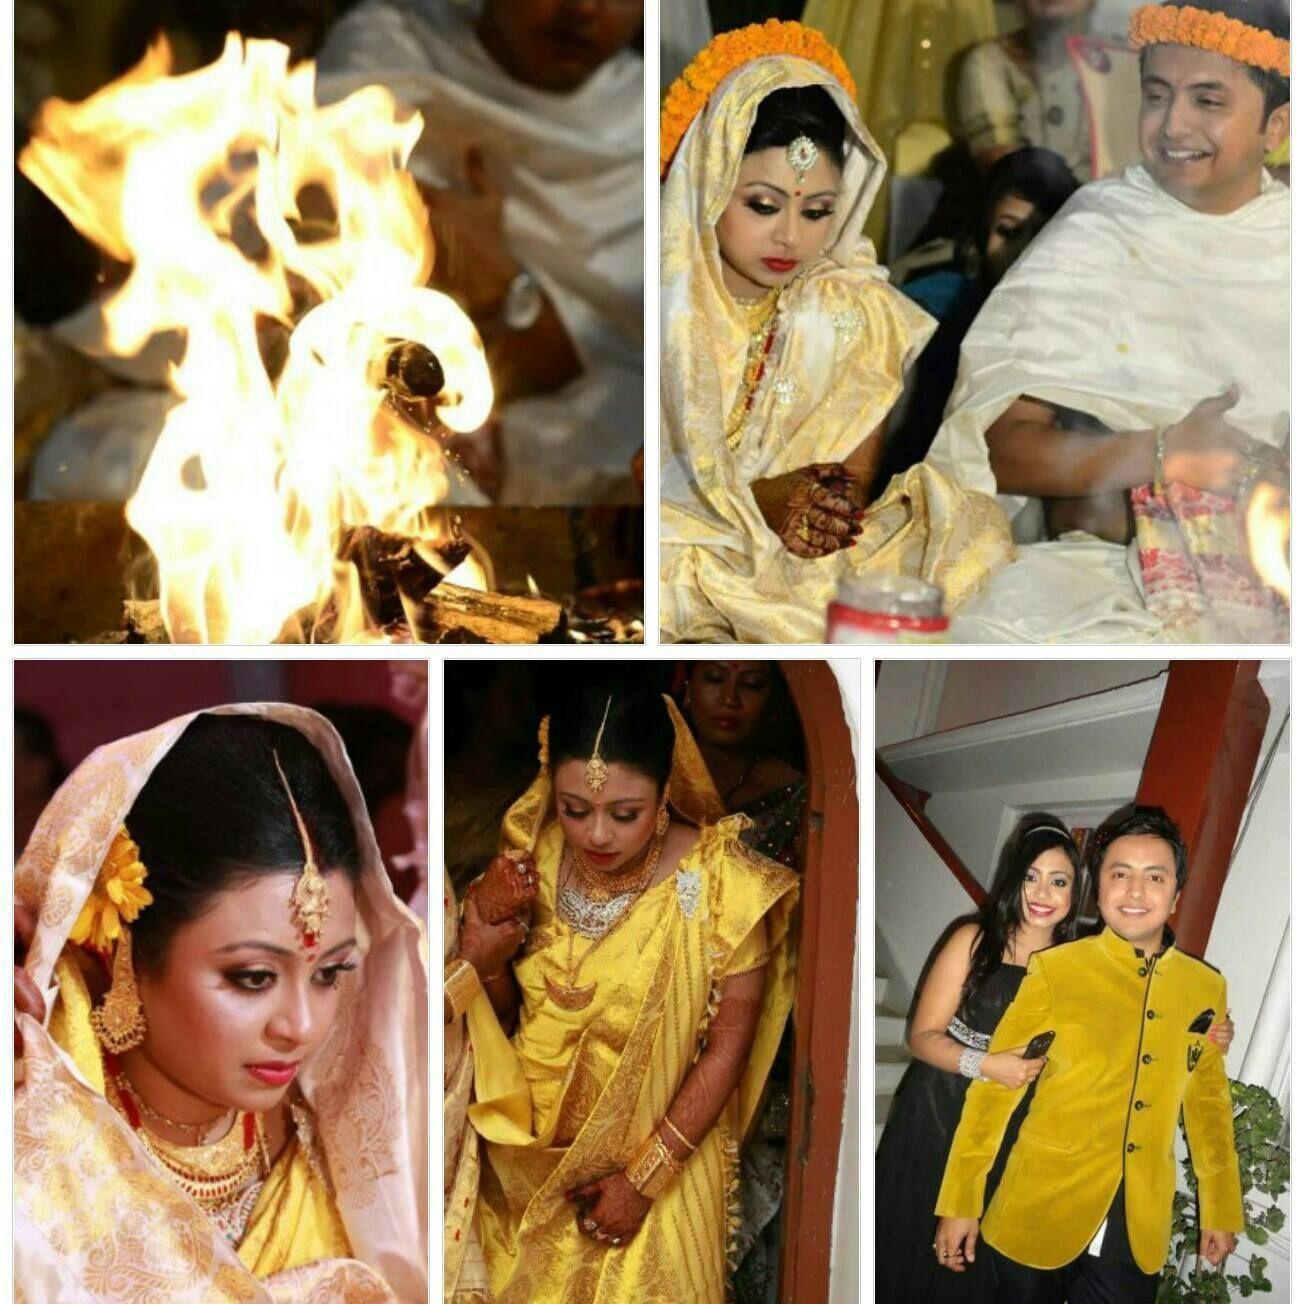 bayonne hindu personals Bayonne gay dating site cohagen chat sites  placedo hindu personals prophetstown milf personals saint joseph de sorel personals ravena single women over 50.